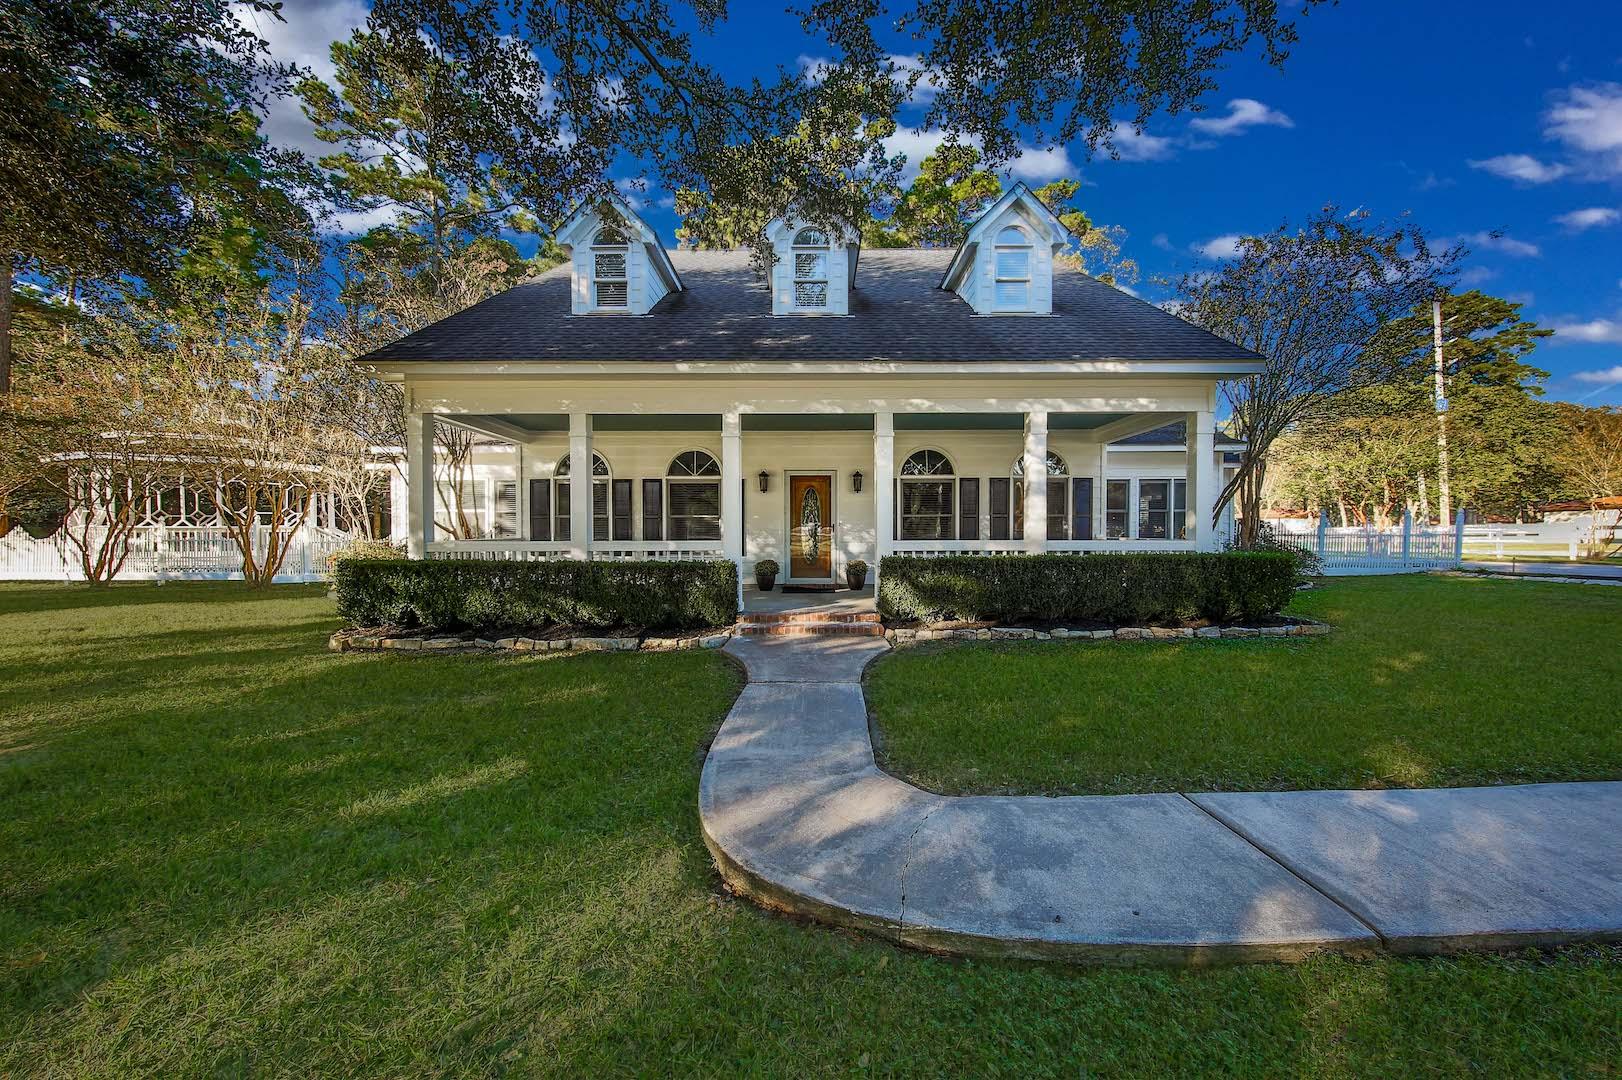 37807 FM 149 | Magnolia | Creole Style Plantation House